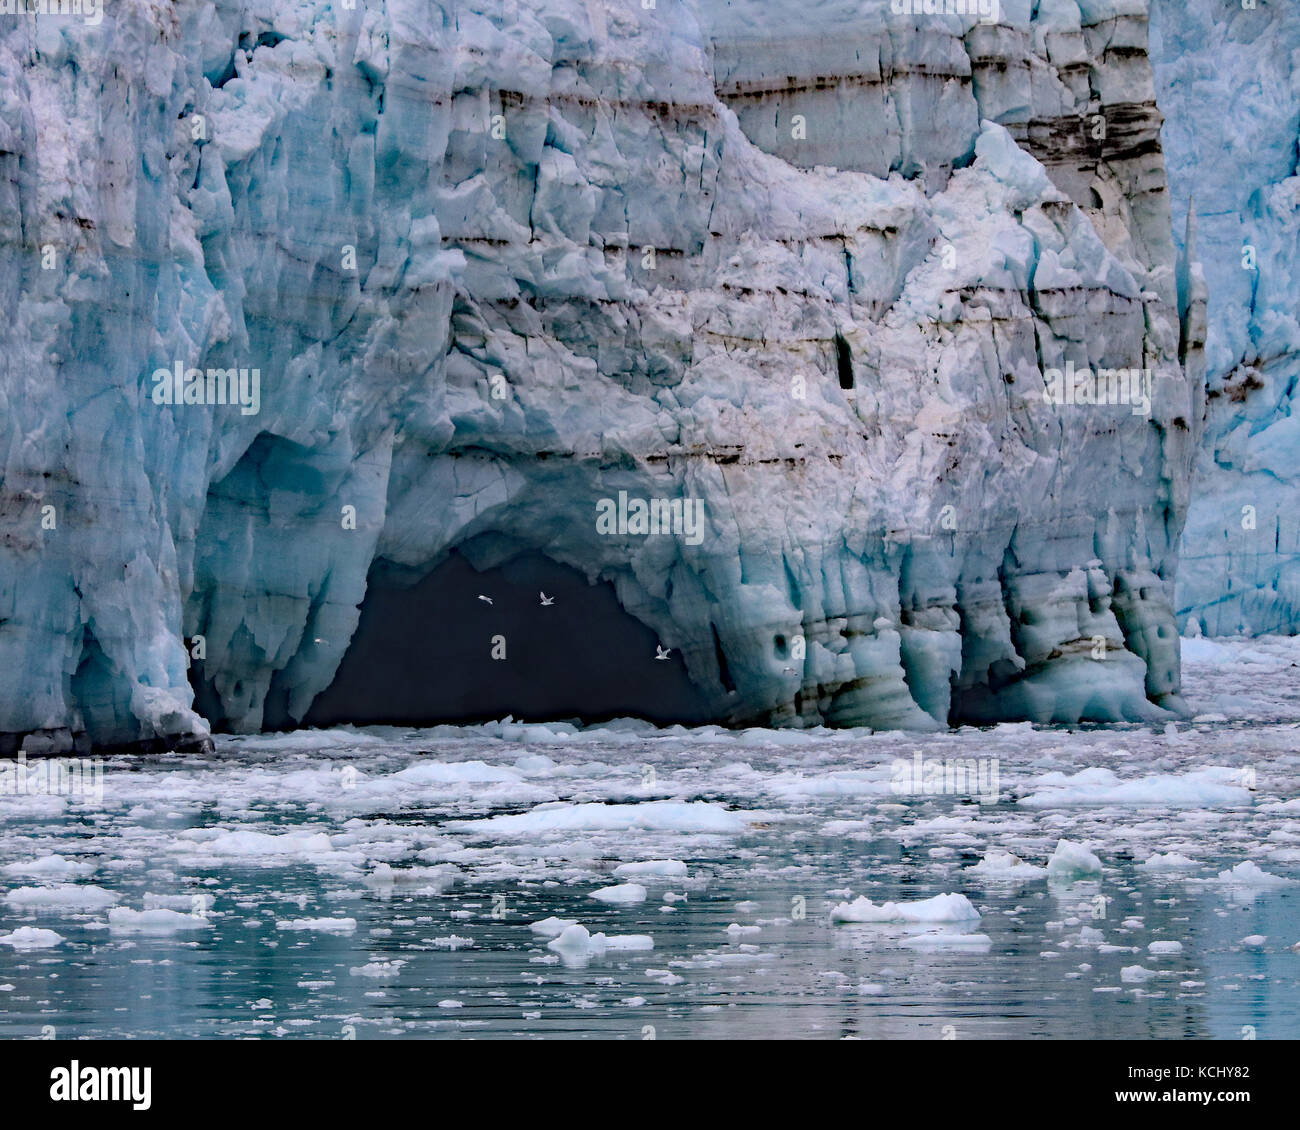 Seagulls flying into a melt water cavern on Margerie Glacier in Glacier Bay National Park and Preserve, Alaska - Stock Image